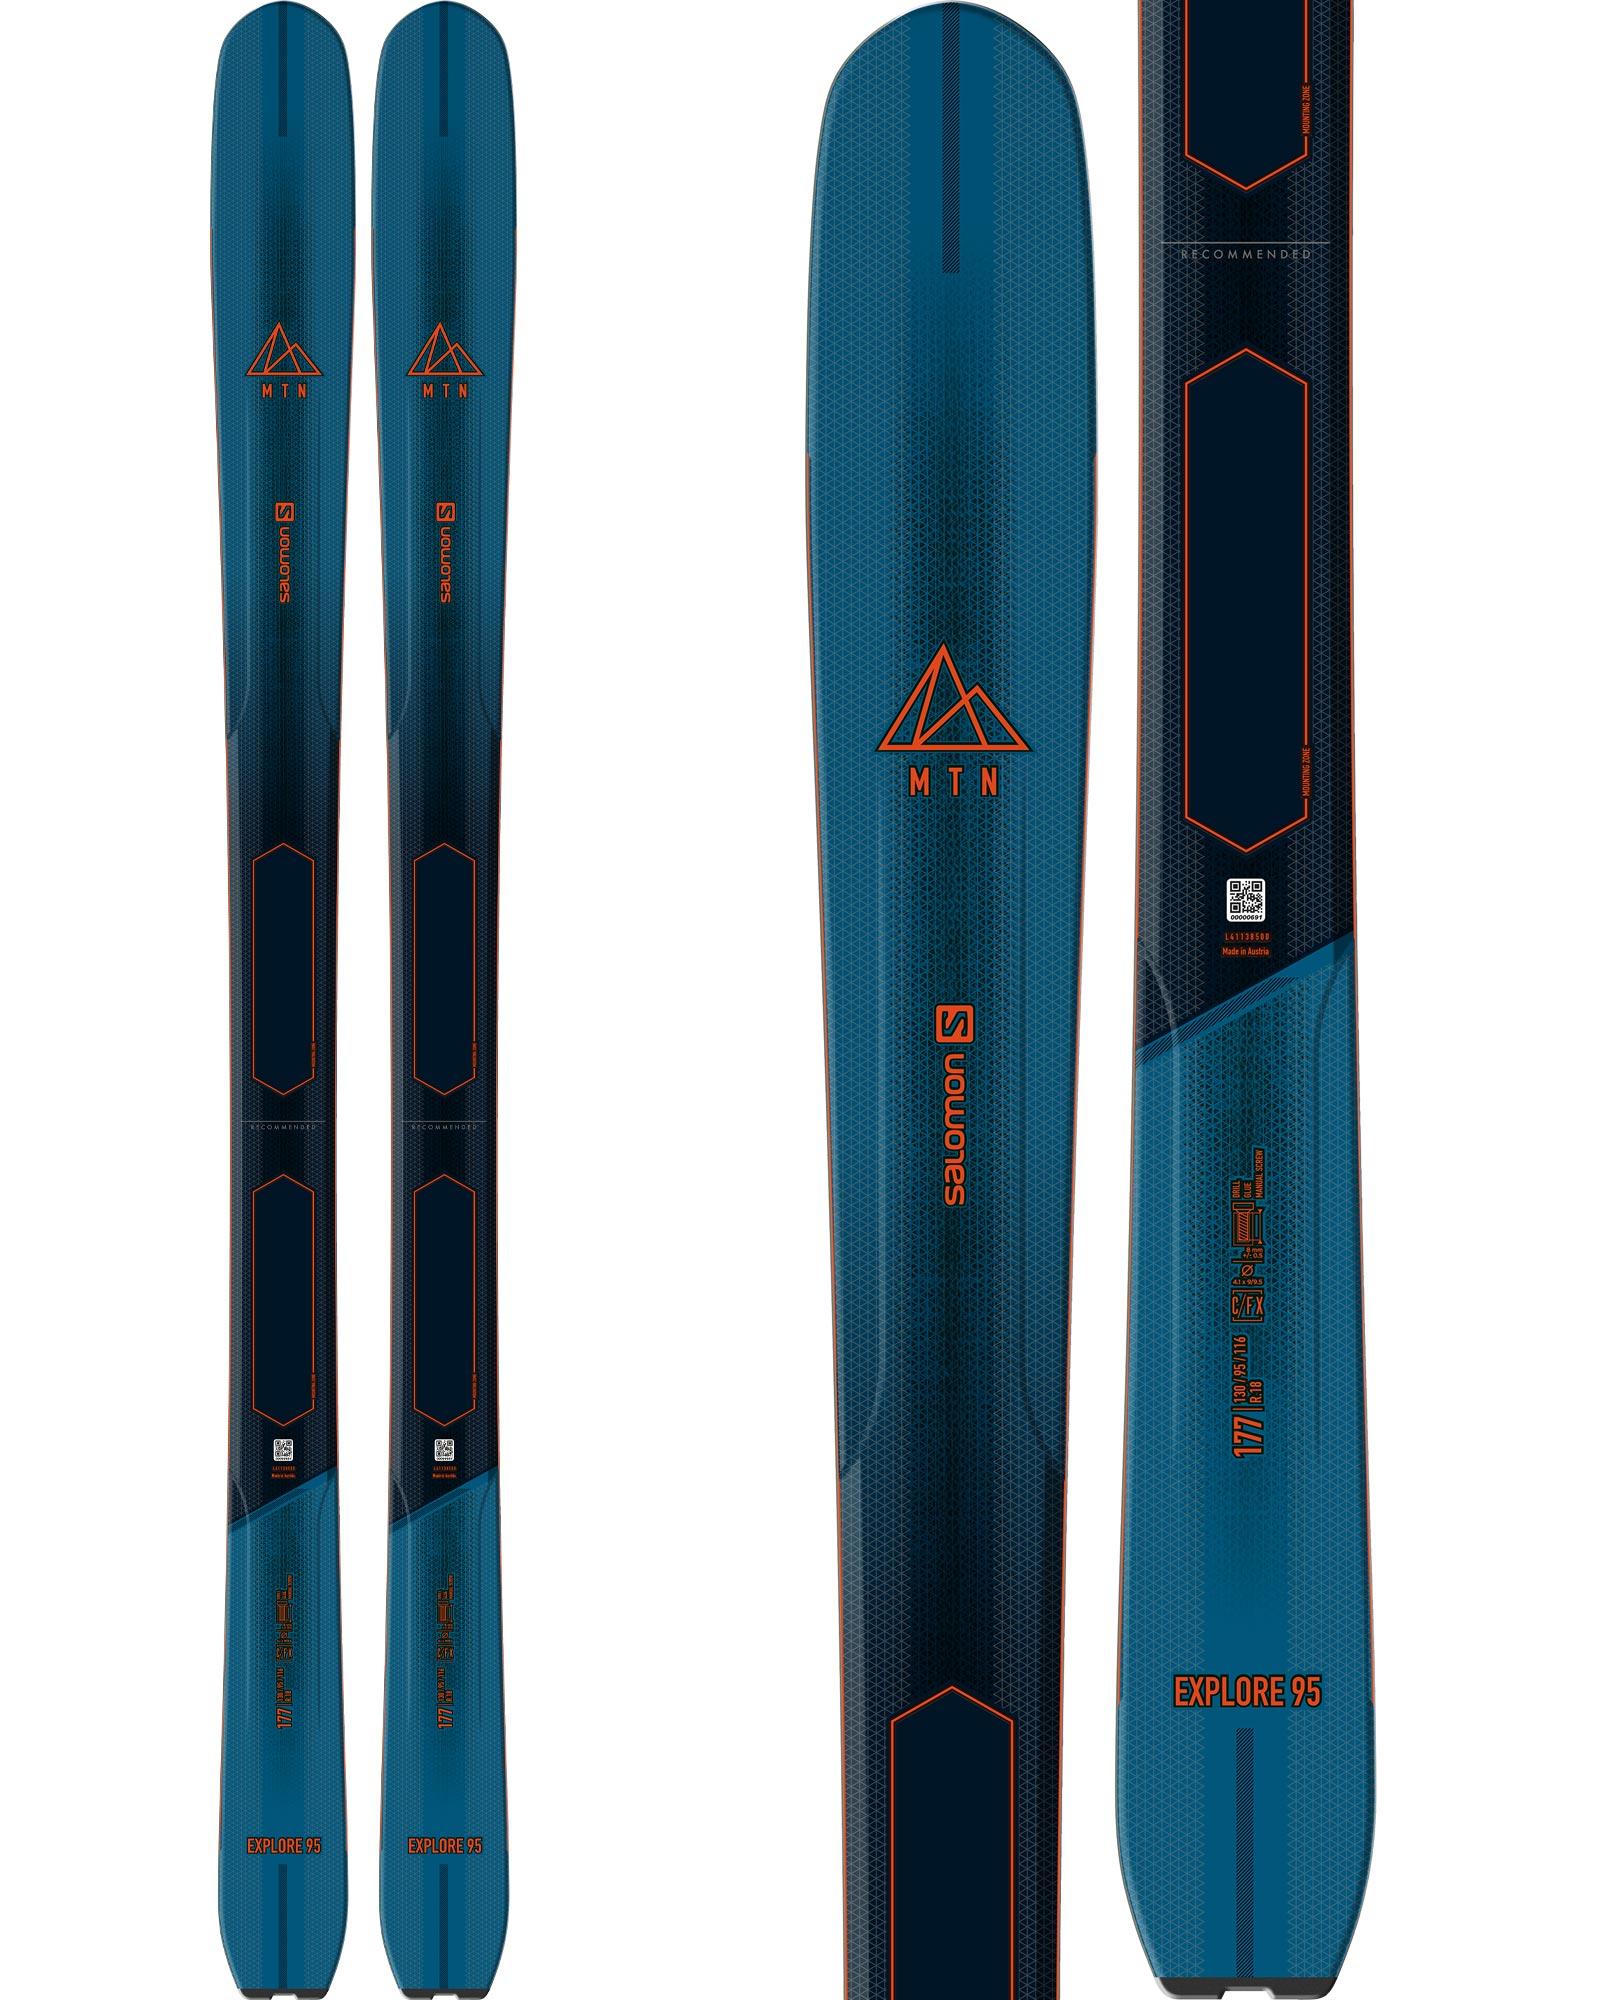 Salomon MTN Explore 95 Backcountry Skis 2020 / 2021 0